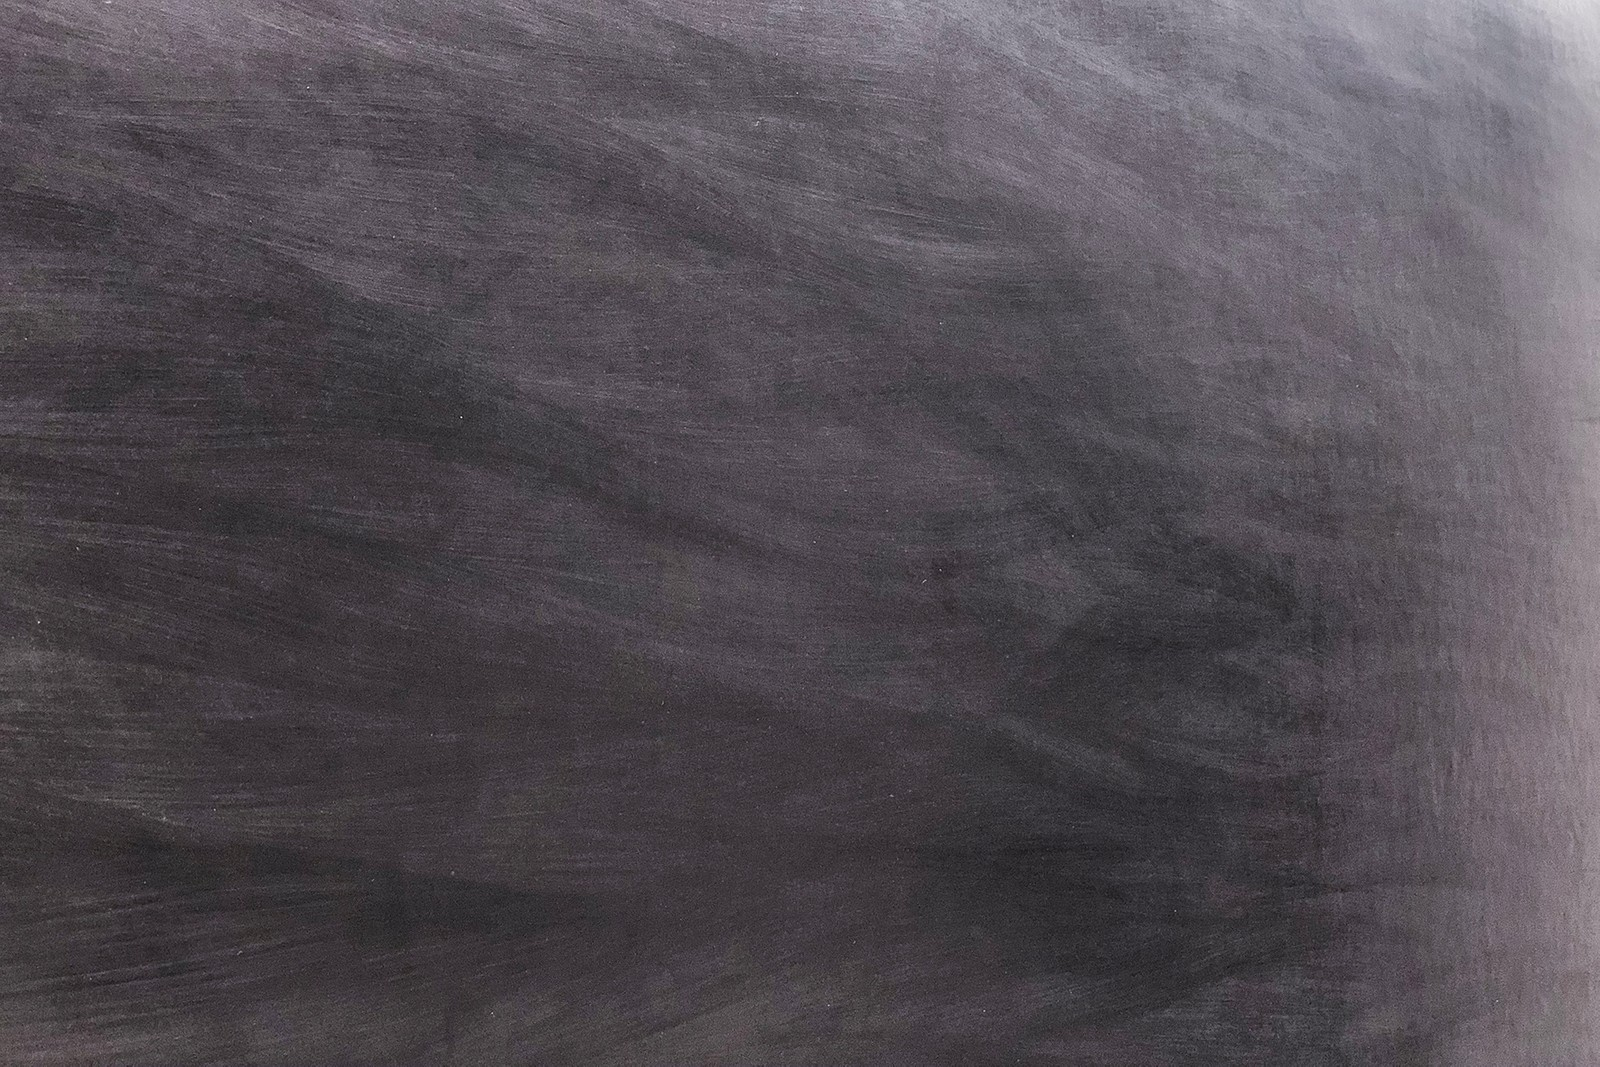 北野武、David Lynch 参上-Cartier 当代艺术基金会《A Beautiful Elsewhere》展览限定开展 -https%3A%2F%2Fhk.hypebeast.com%2Ffiles%2F2018%2F06%2Ffondation-cartier-pour-lart-contemporain-shanghai-a-beautiful-elsewhere-32